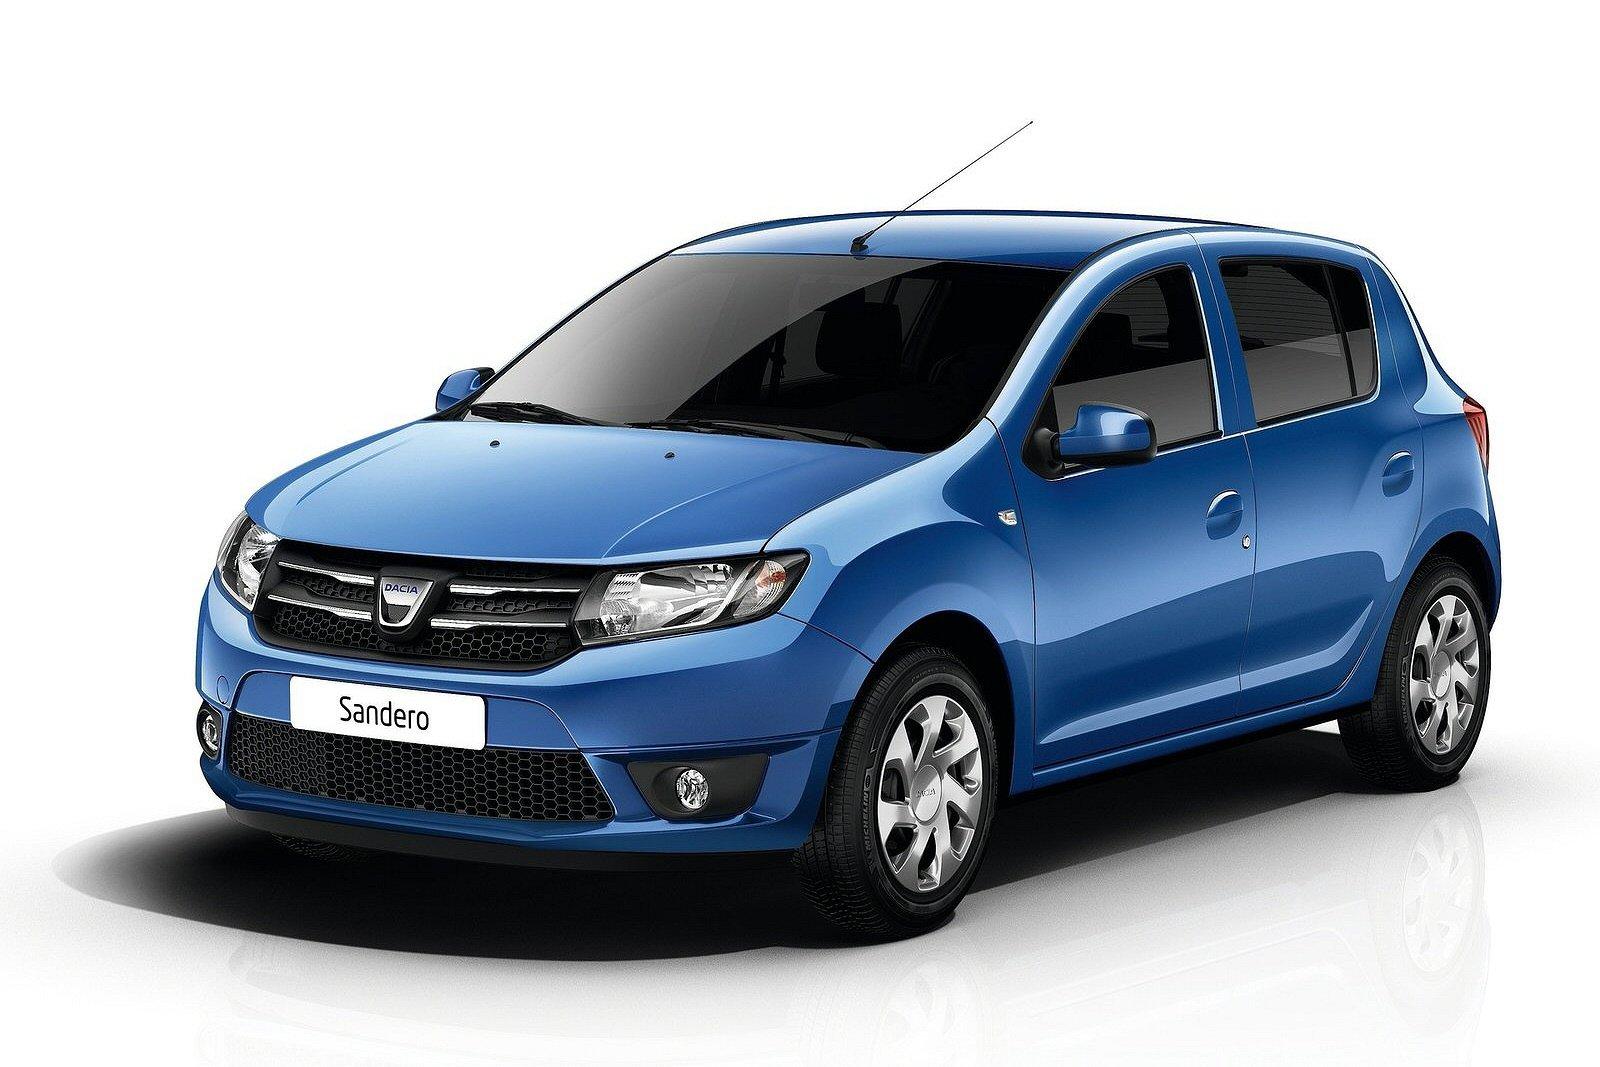 2014 Dacia Sandero Front View